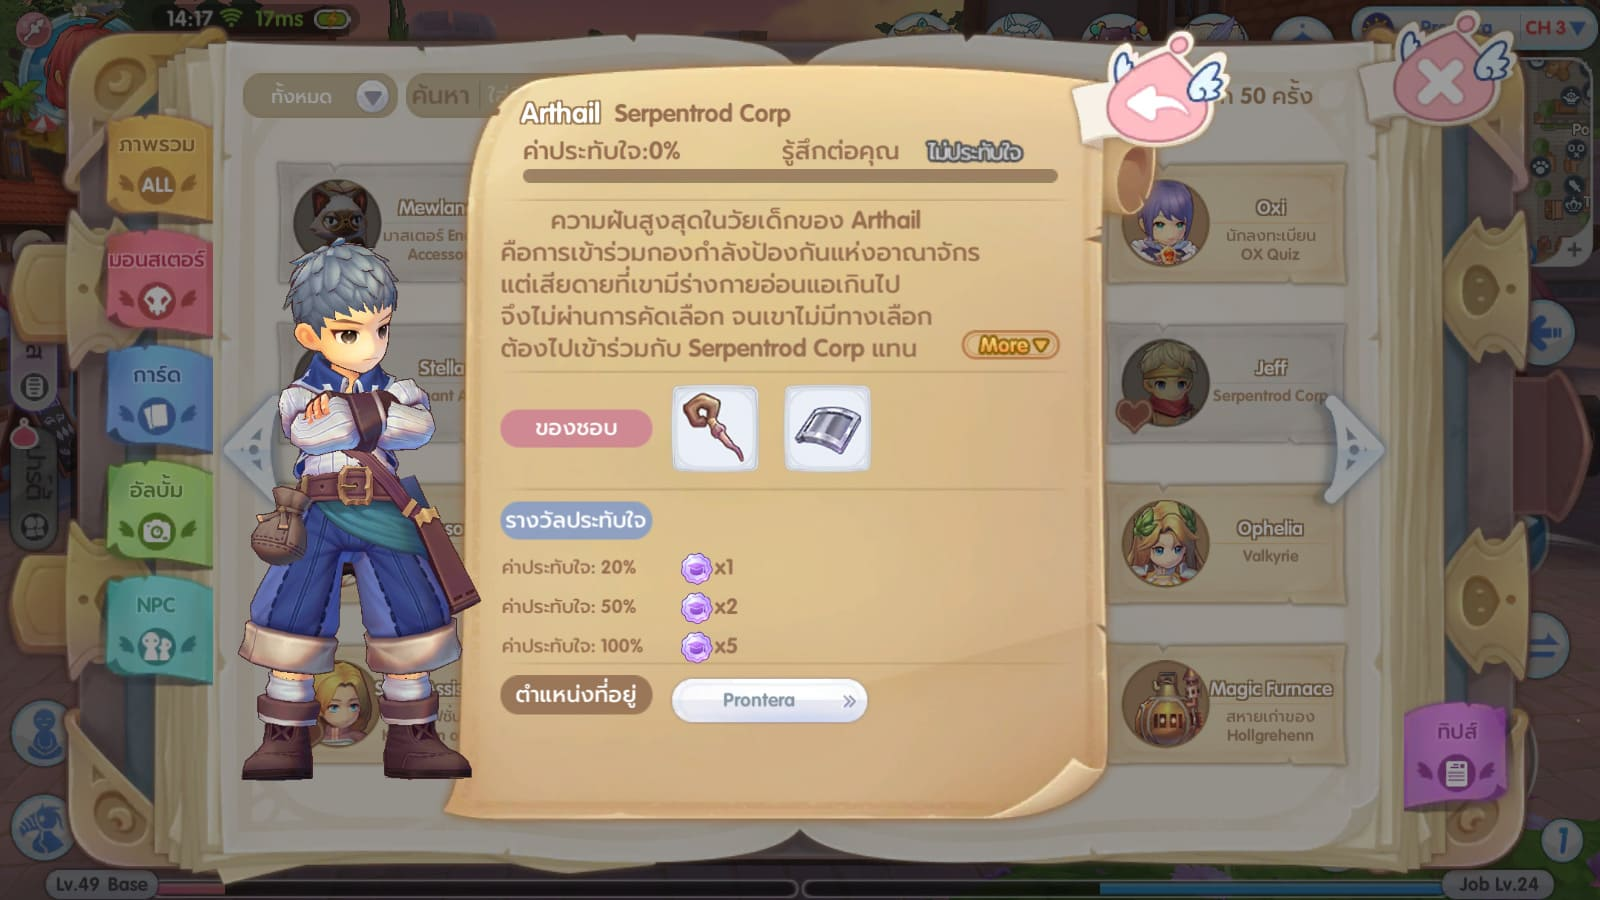 ROX- NPC Items Gift for Arthail